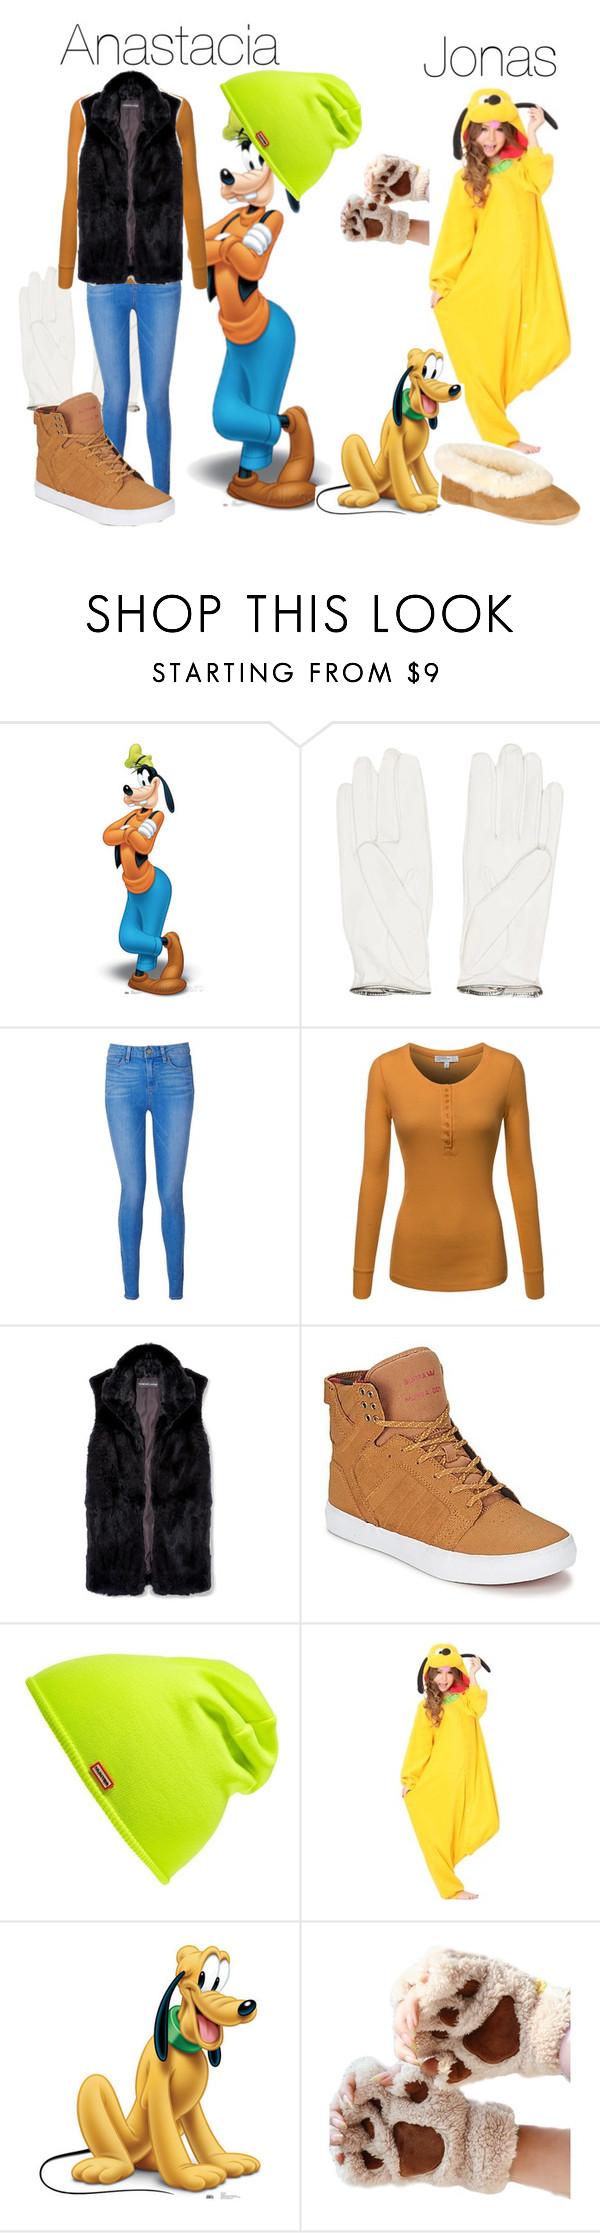 """Halloween Costumes (3/3)"" by zauberumhang on Polyvore featuring interior, interiors, interior design, Zuhause, home decor, interior decorating, Chanel, Paige Denim, Adrienne Landau und Supra"